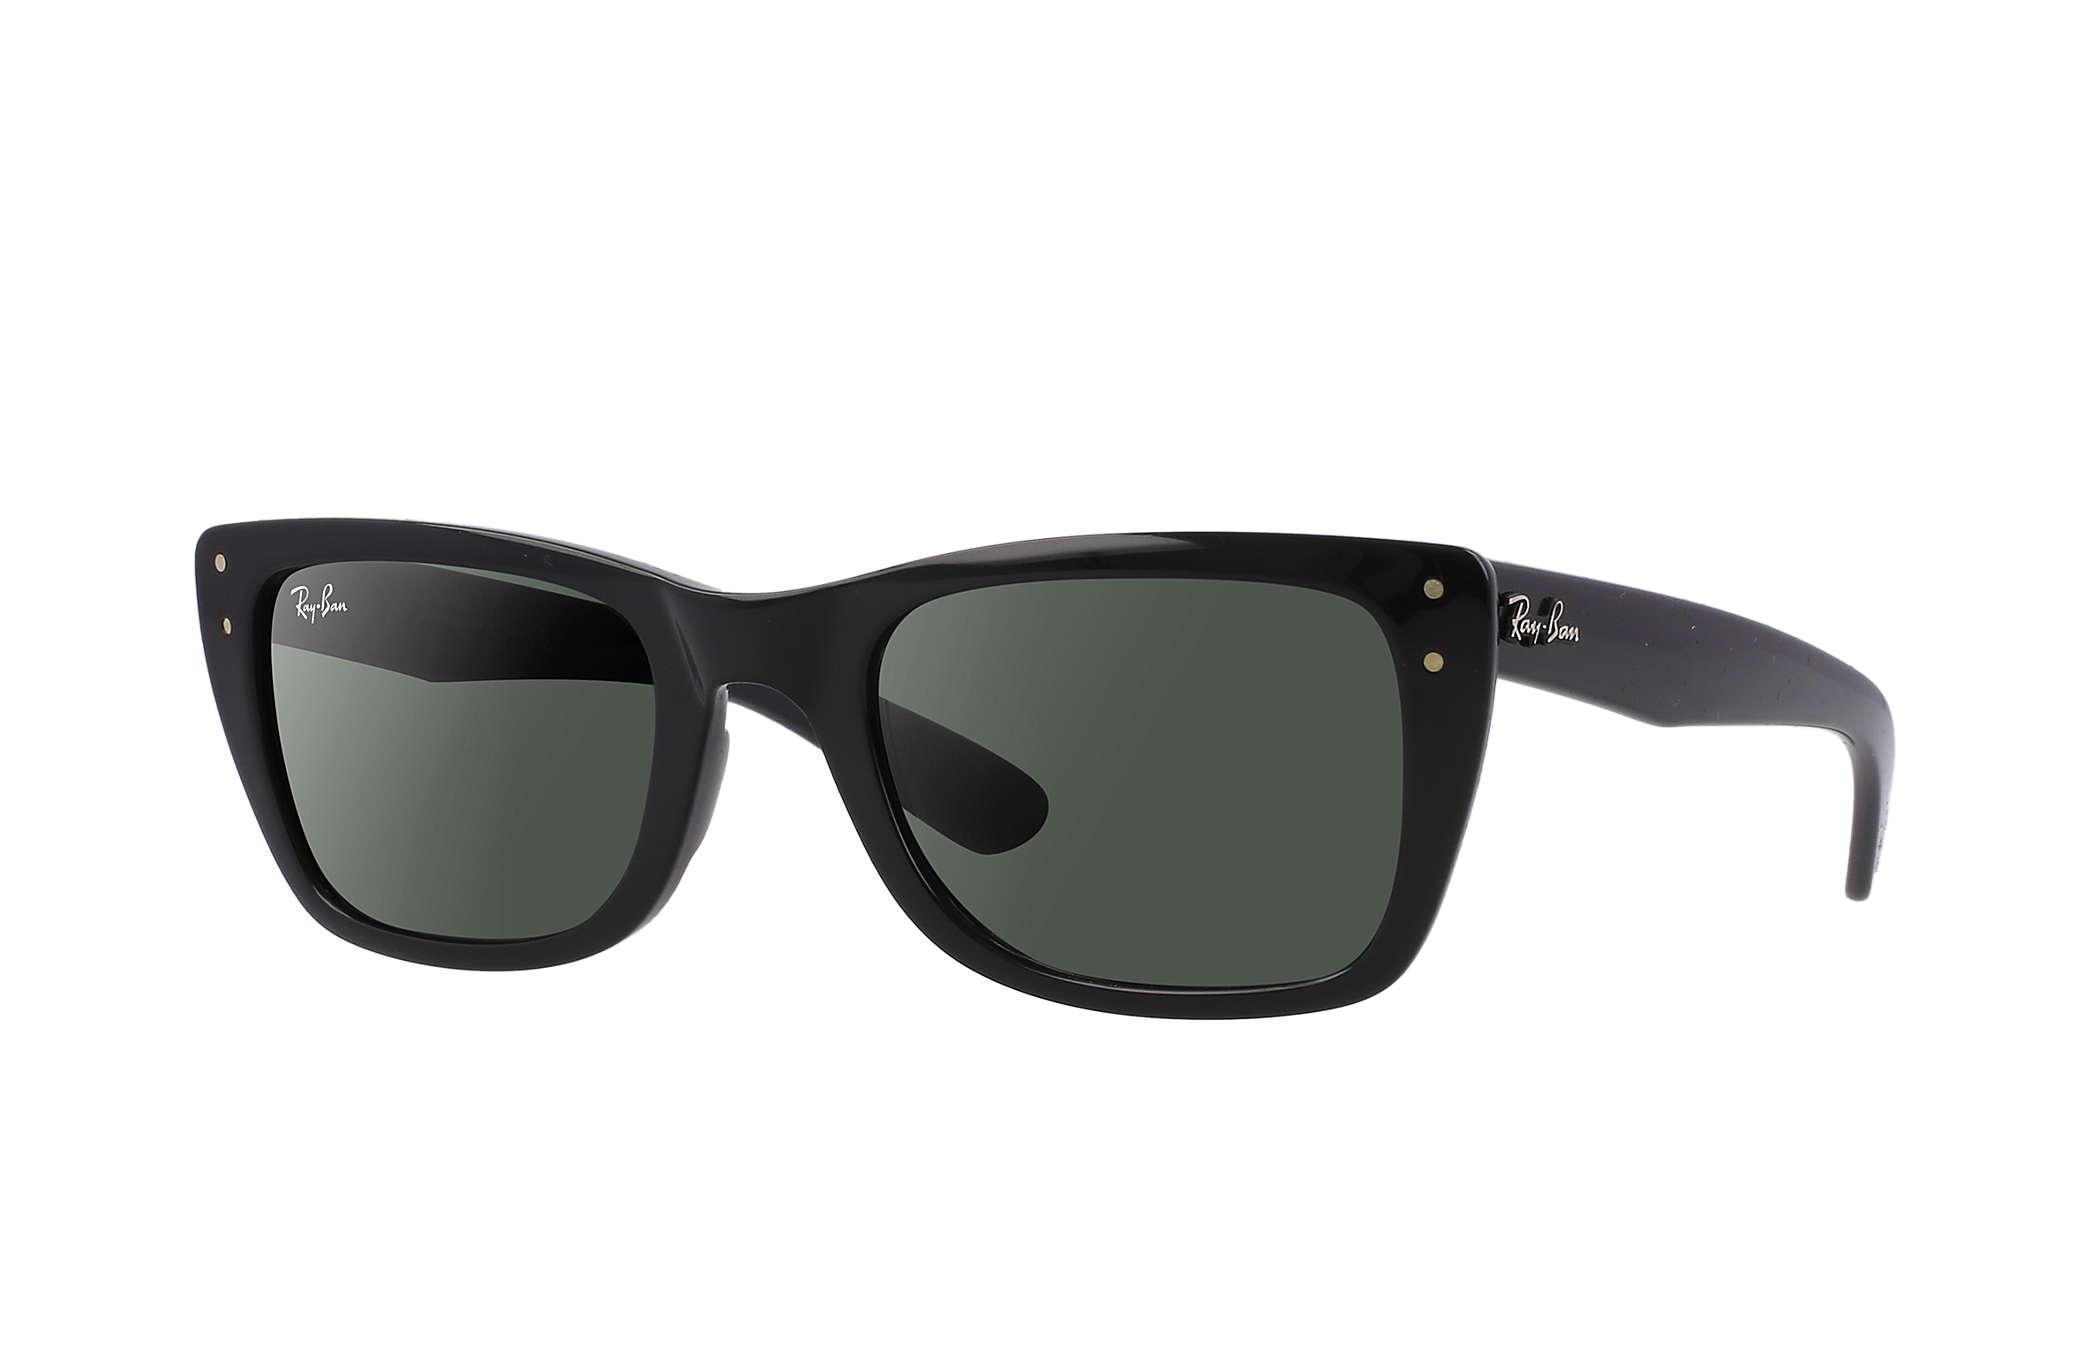 Ray ban sunglasses with price - Ray Ban 0rb4148 Caribbean Black Sun